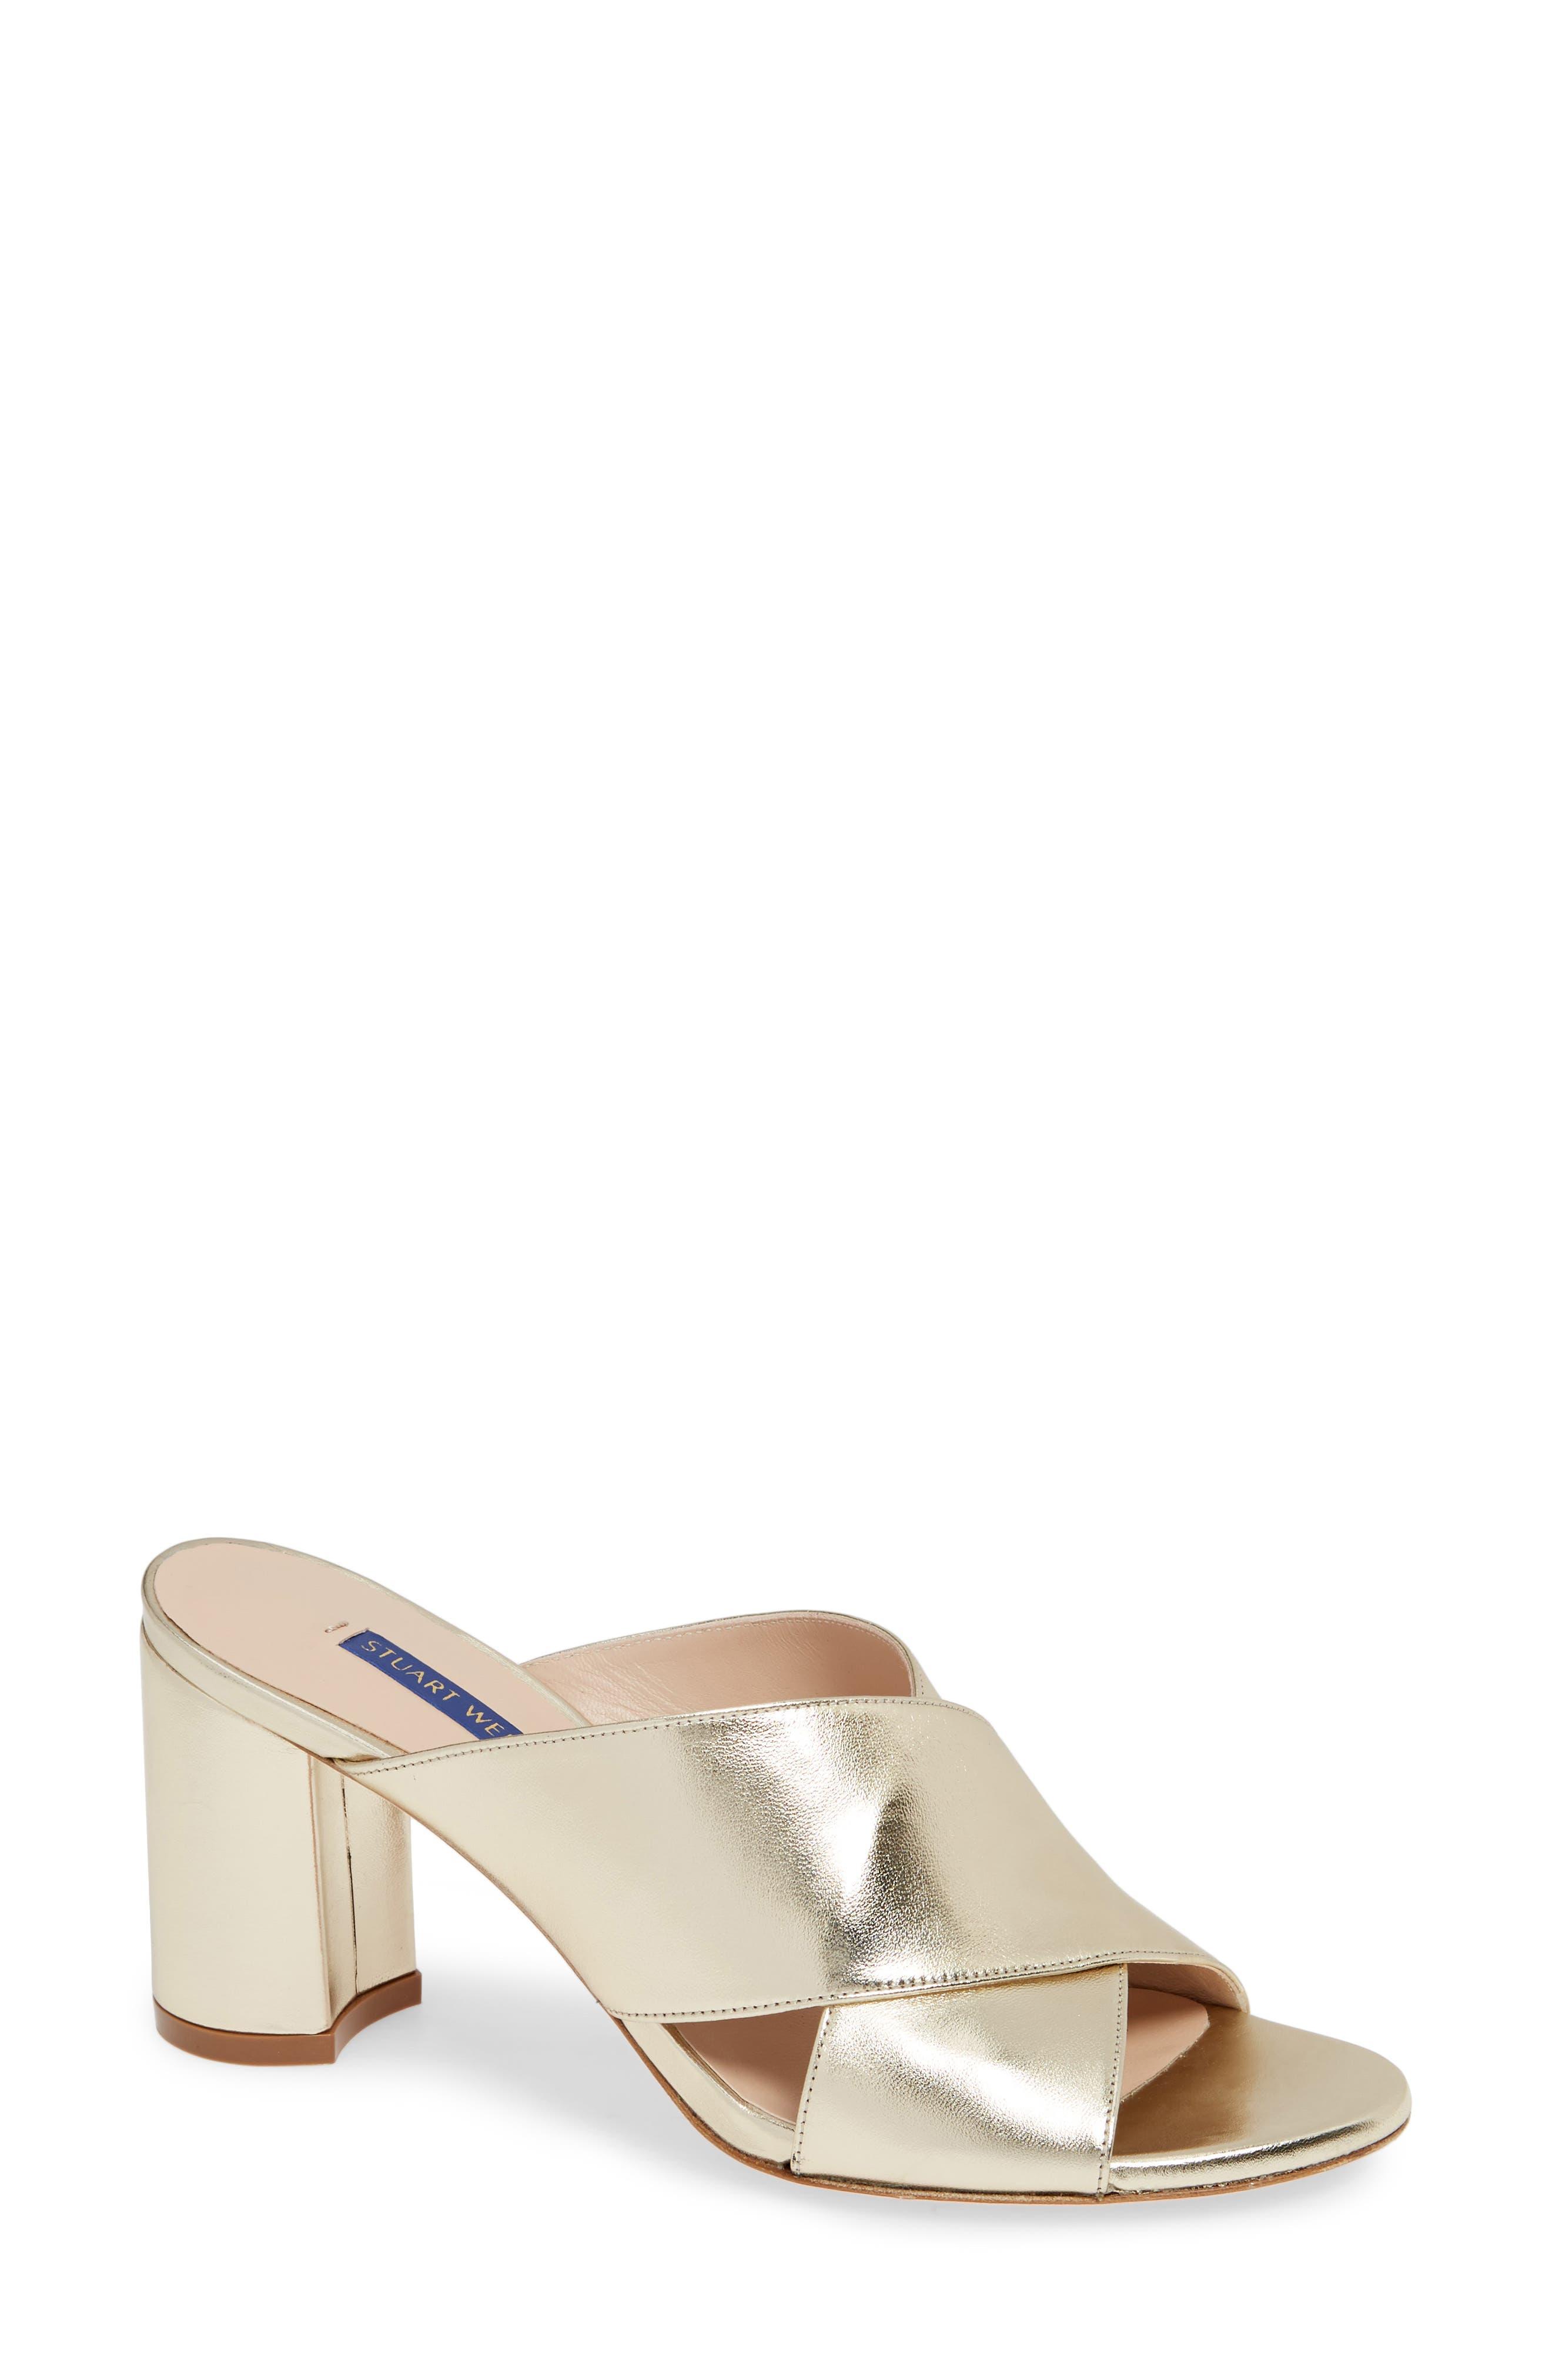 Stuart Weitzman Galene Sandal- Metallic